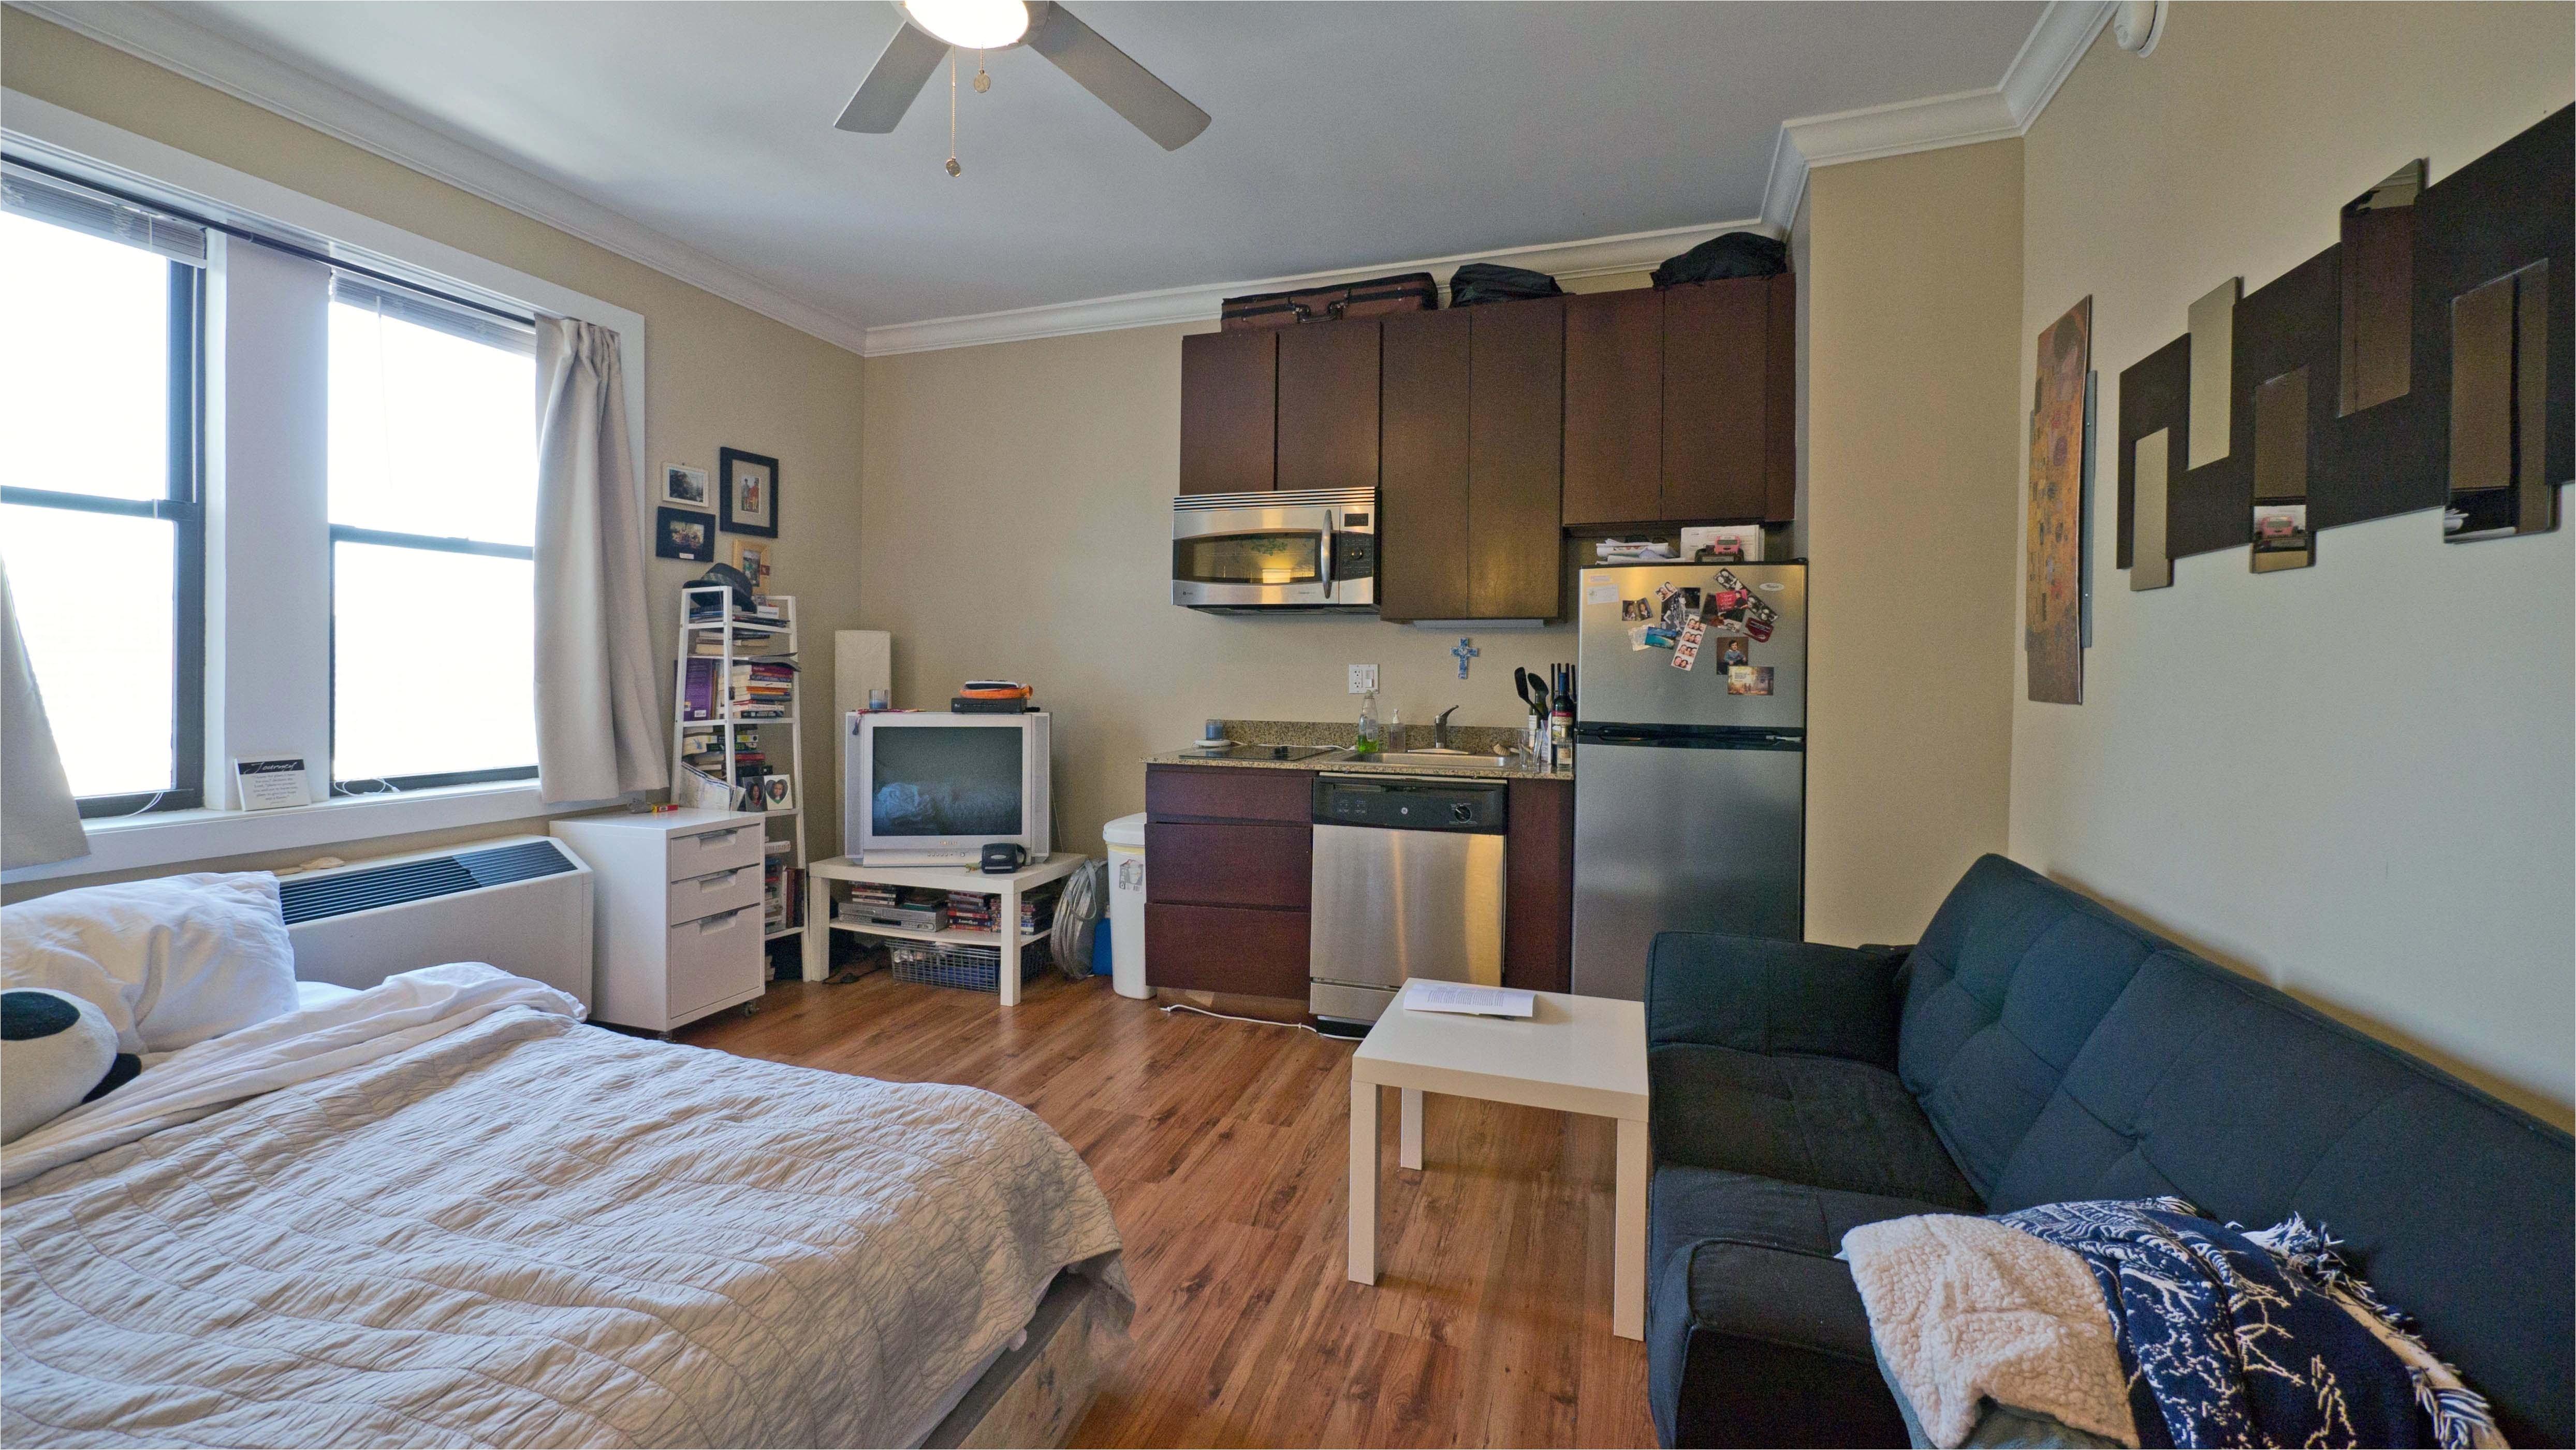 3 Bedroom Apartments For Rent In Elizabeth Nj Craigslist Beautiful